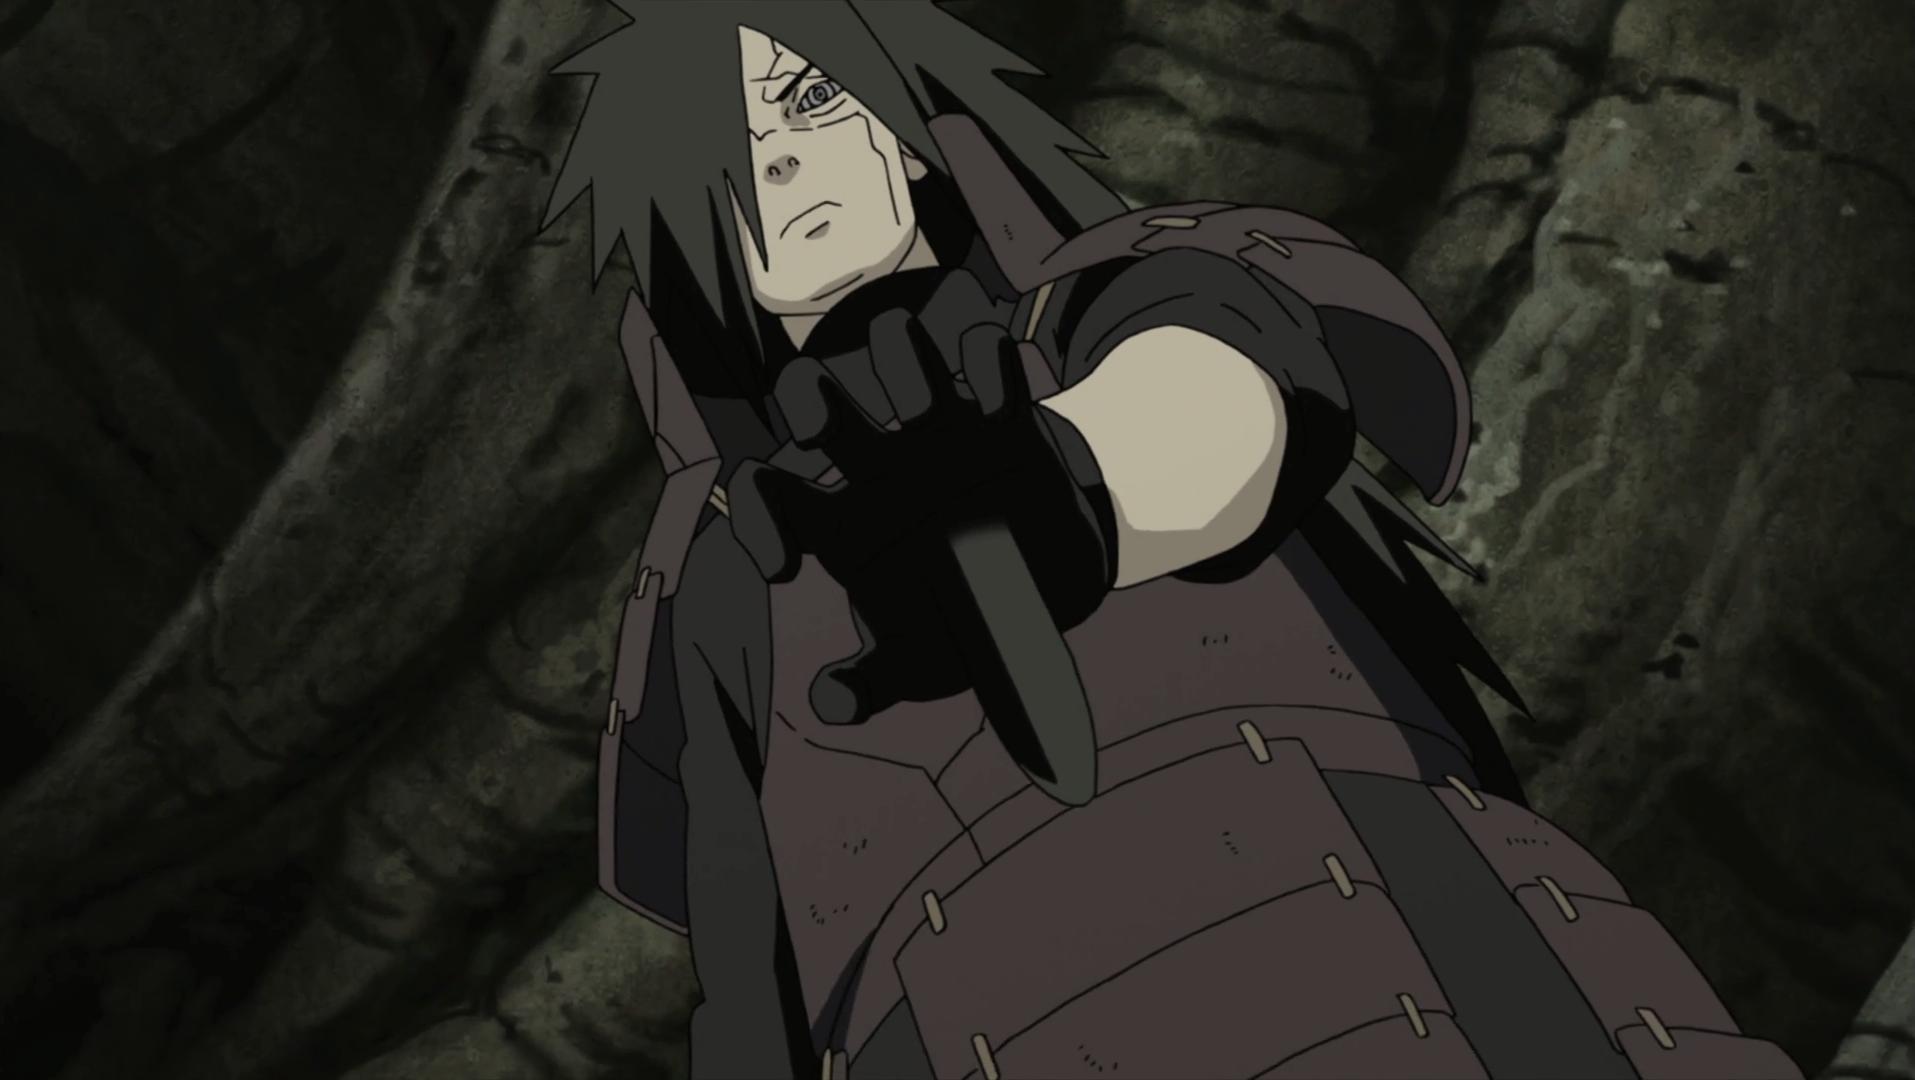 Black Receiver | Narutopedia | FANDOM powered by Wikia